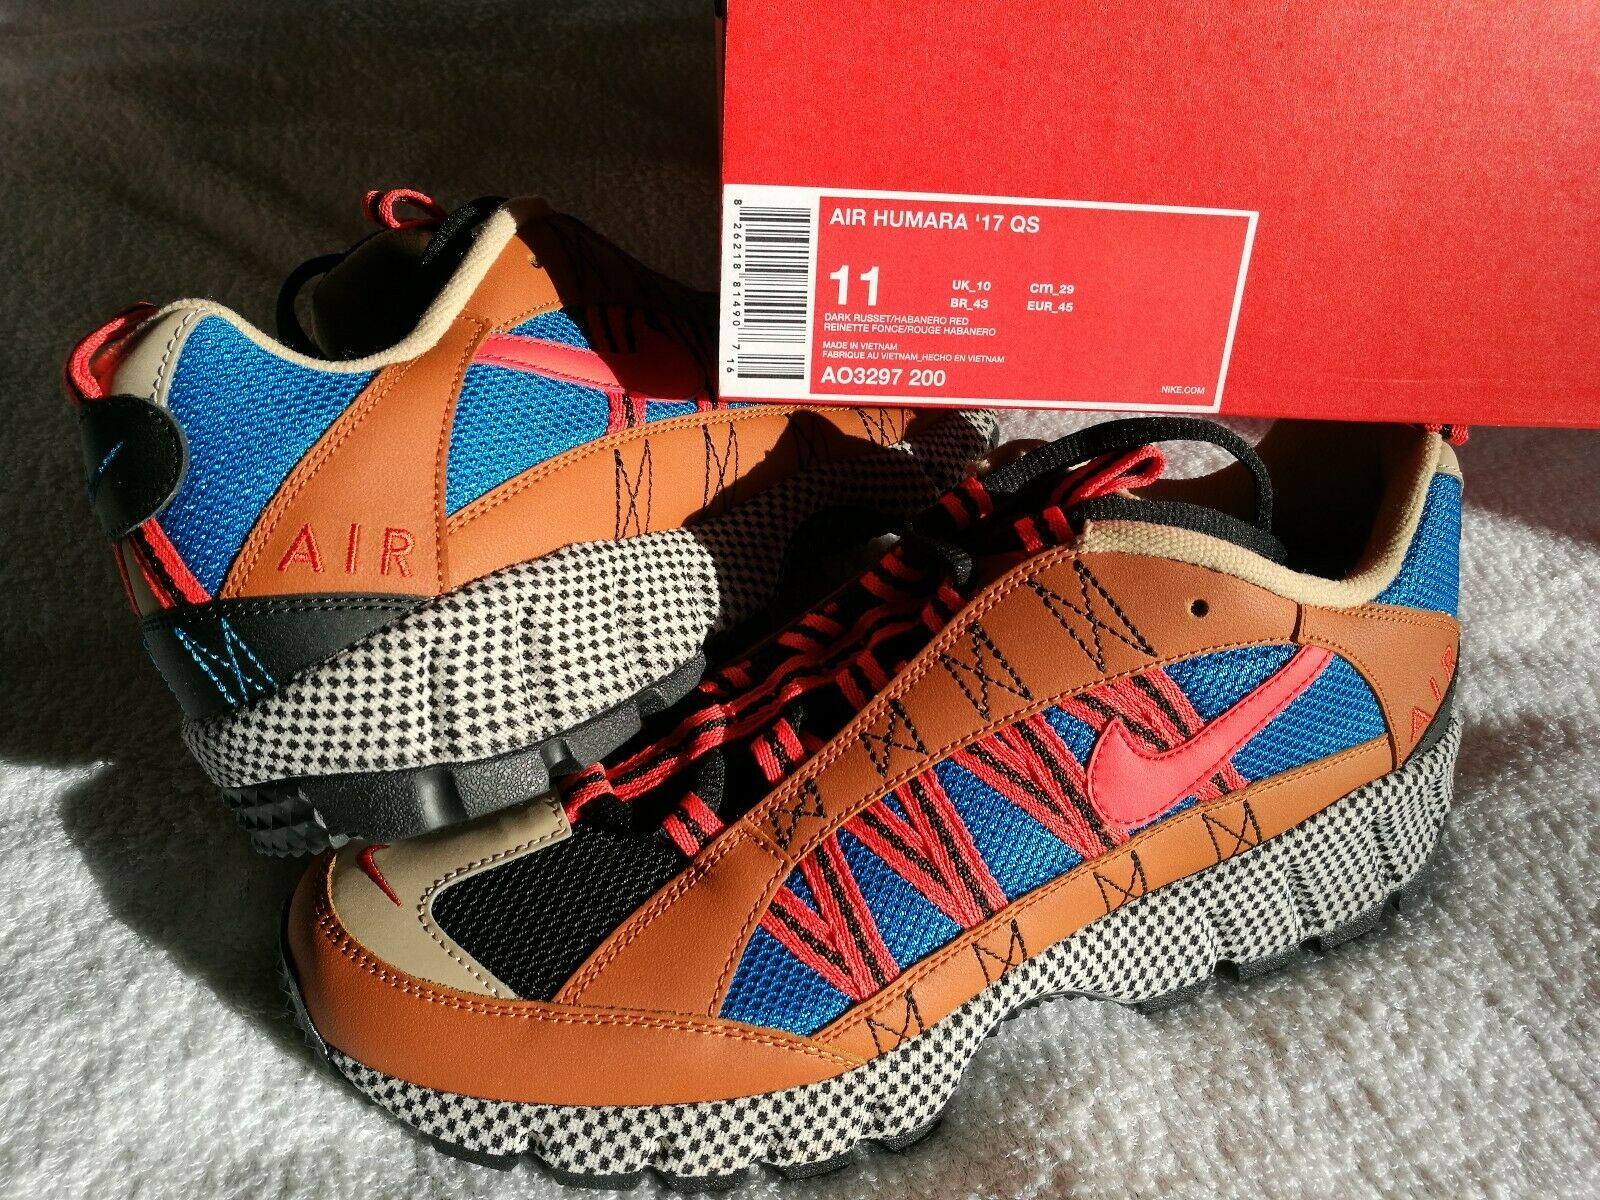 Nike Air Humara 17 QS Walking Boots UK Size 10 NEW in Box R.R.P. .95p